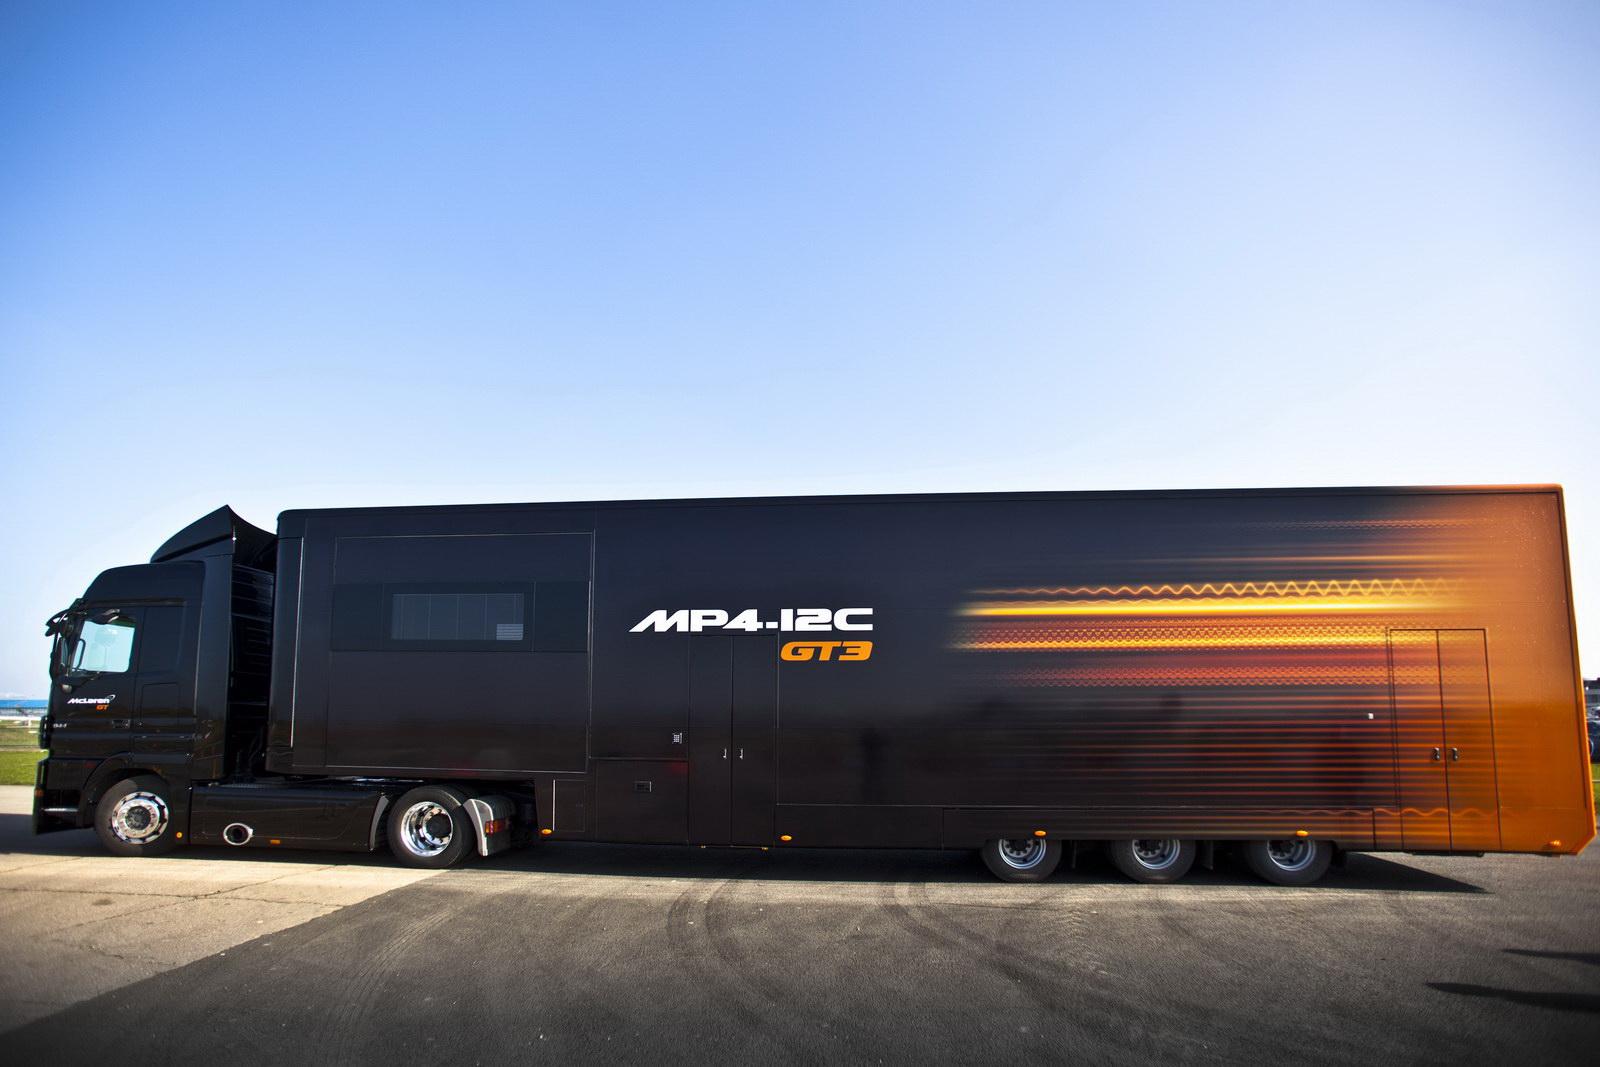 Cars, Trucks, SUVs & Accessories: McLaren\'s MP4-12C GT3